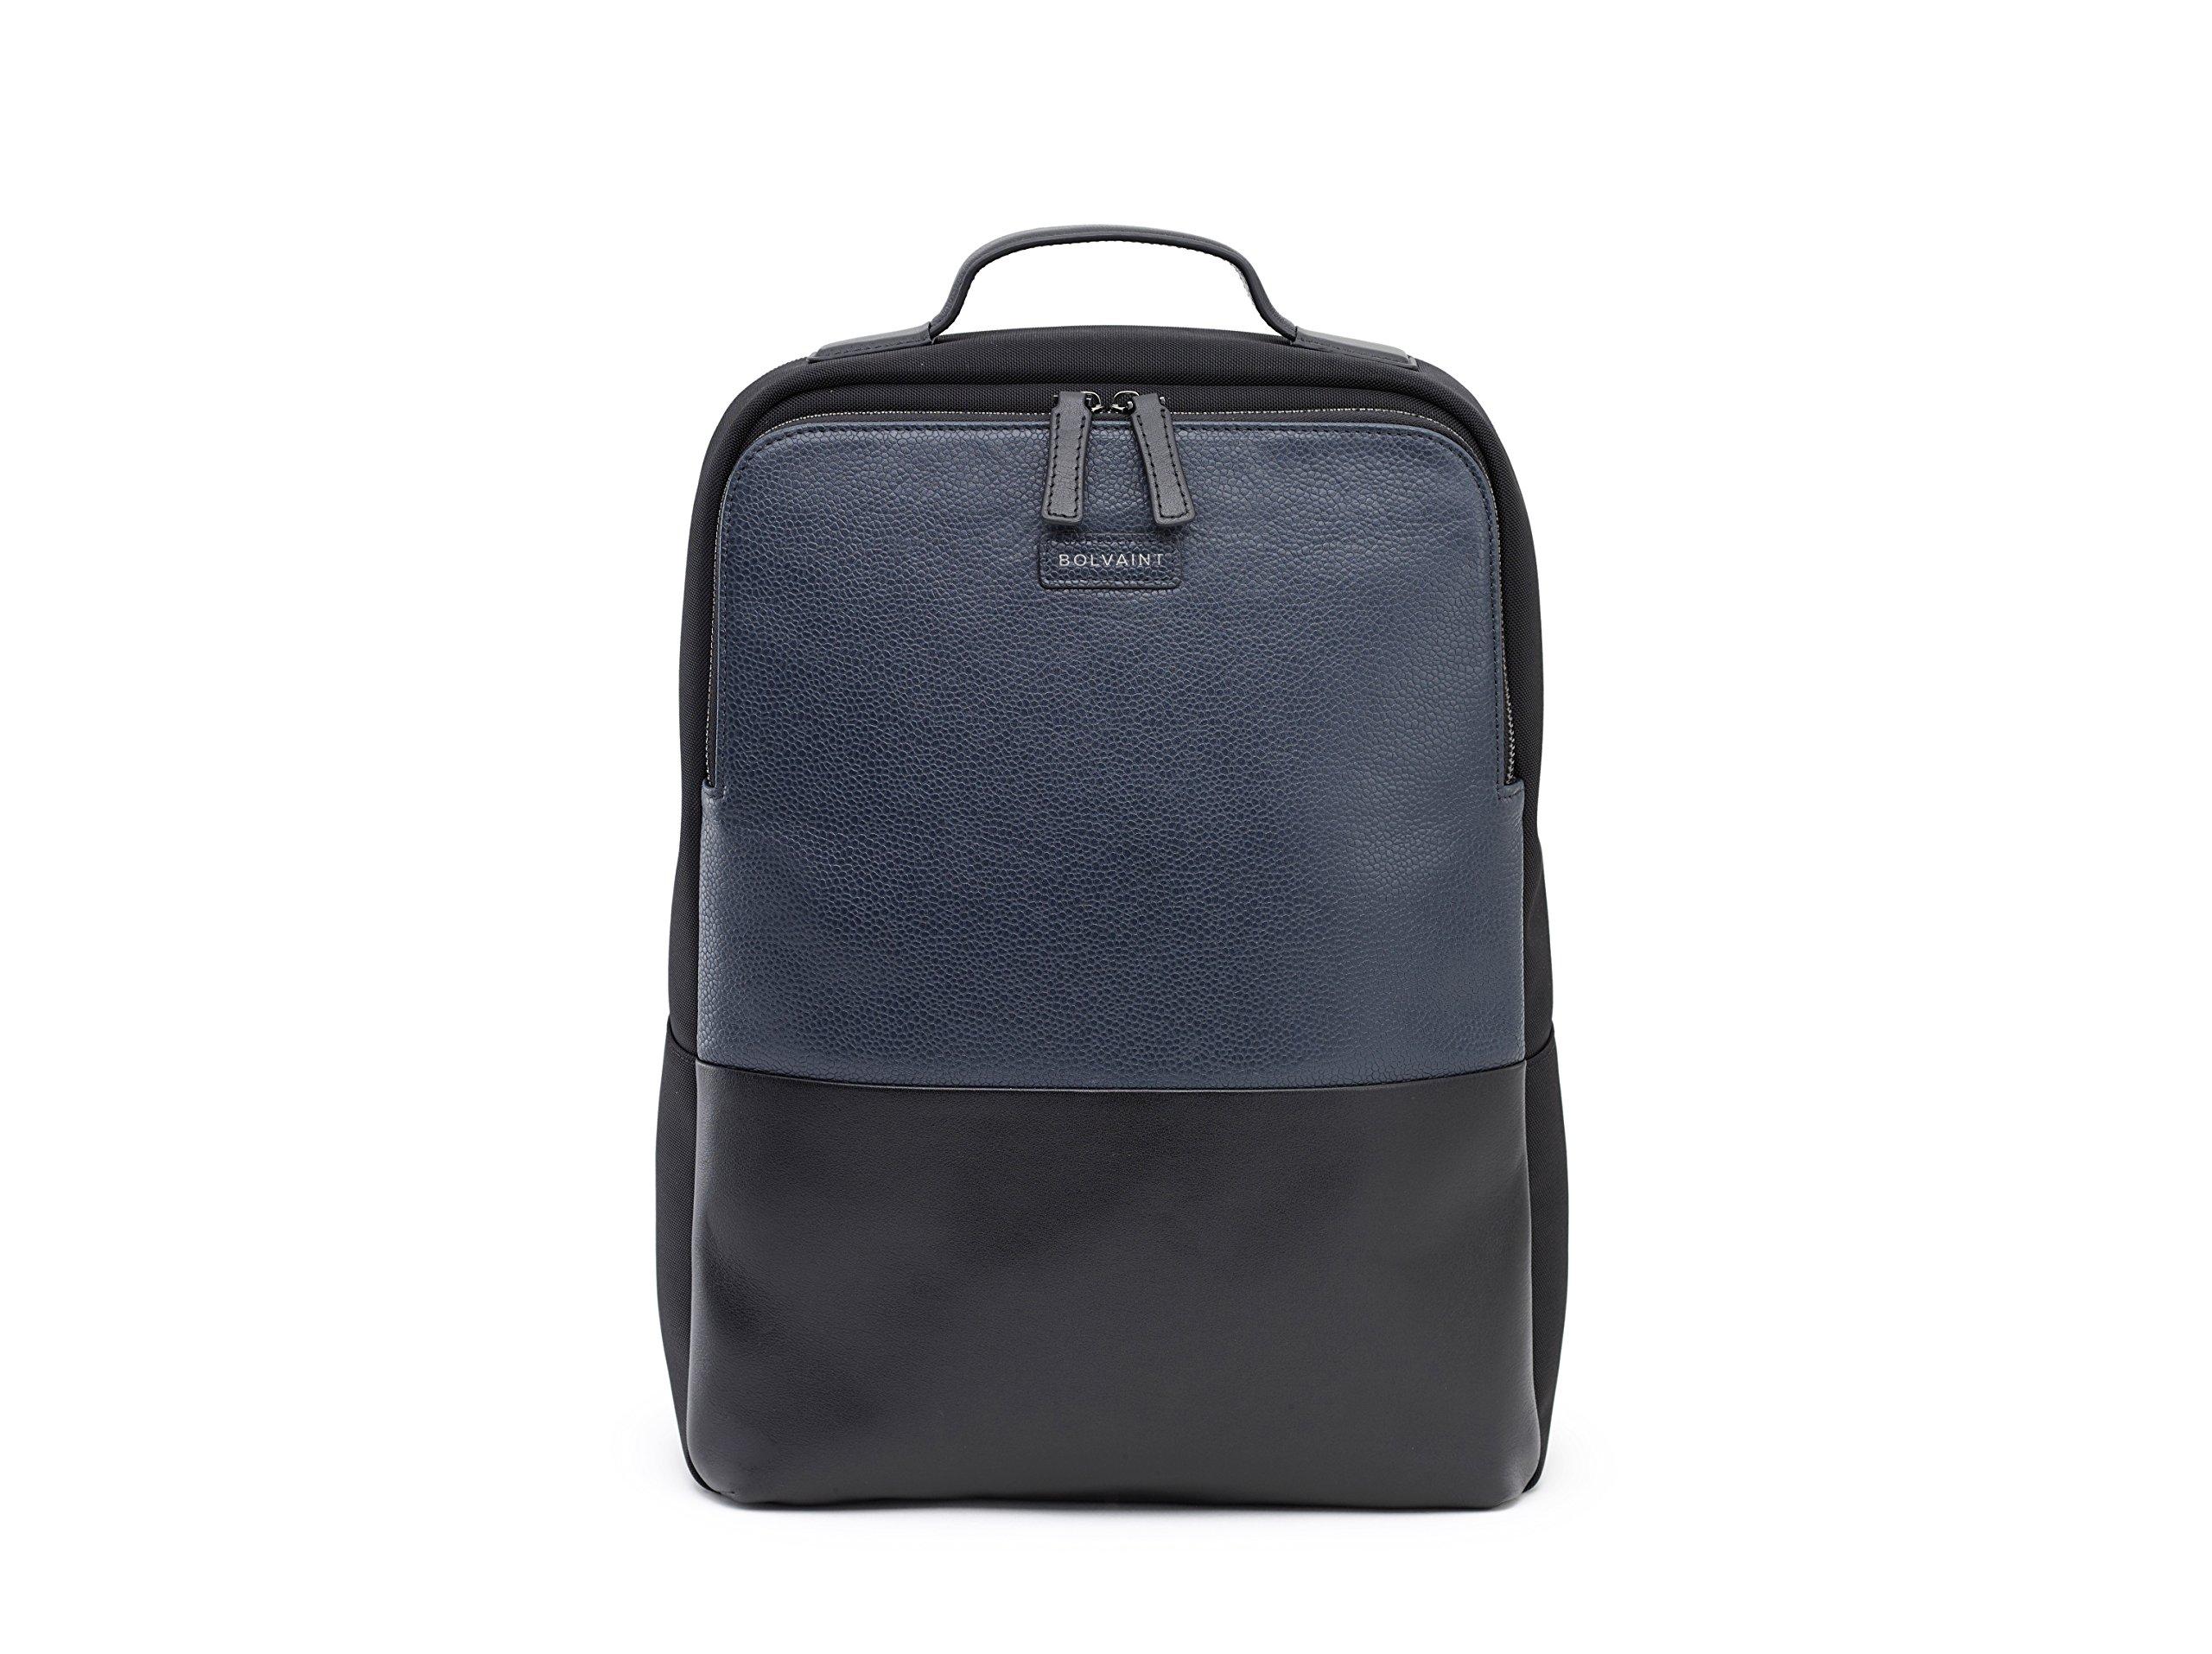 Bolvaint - Giles Backpack